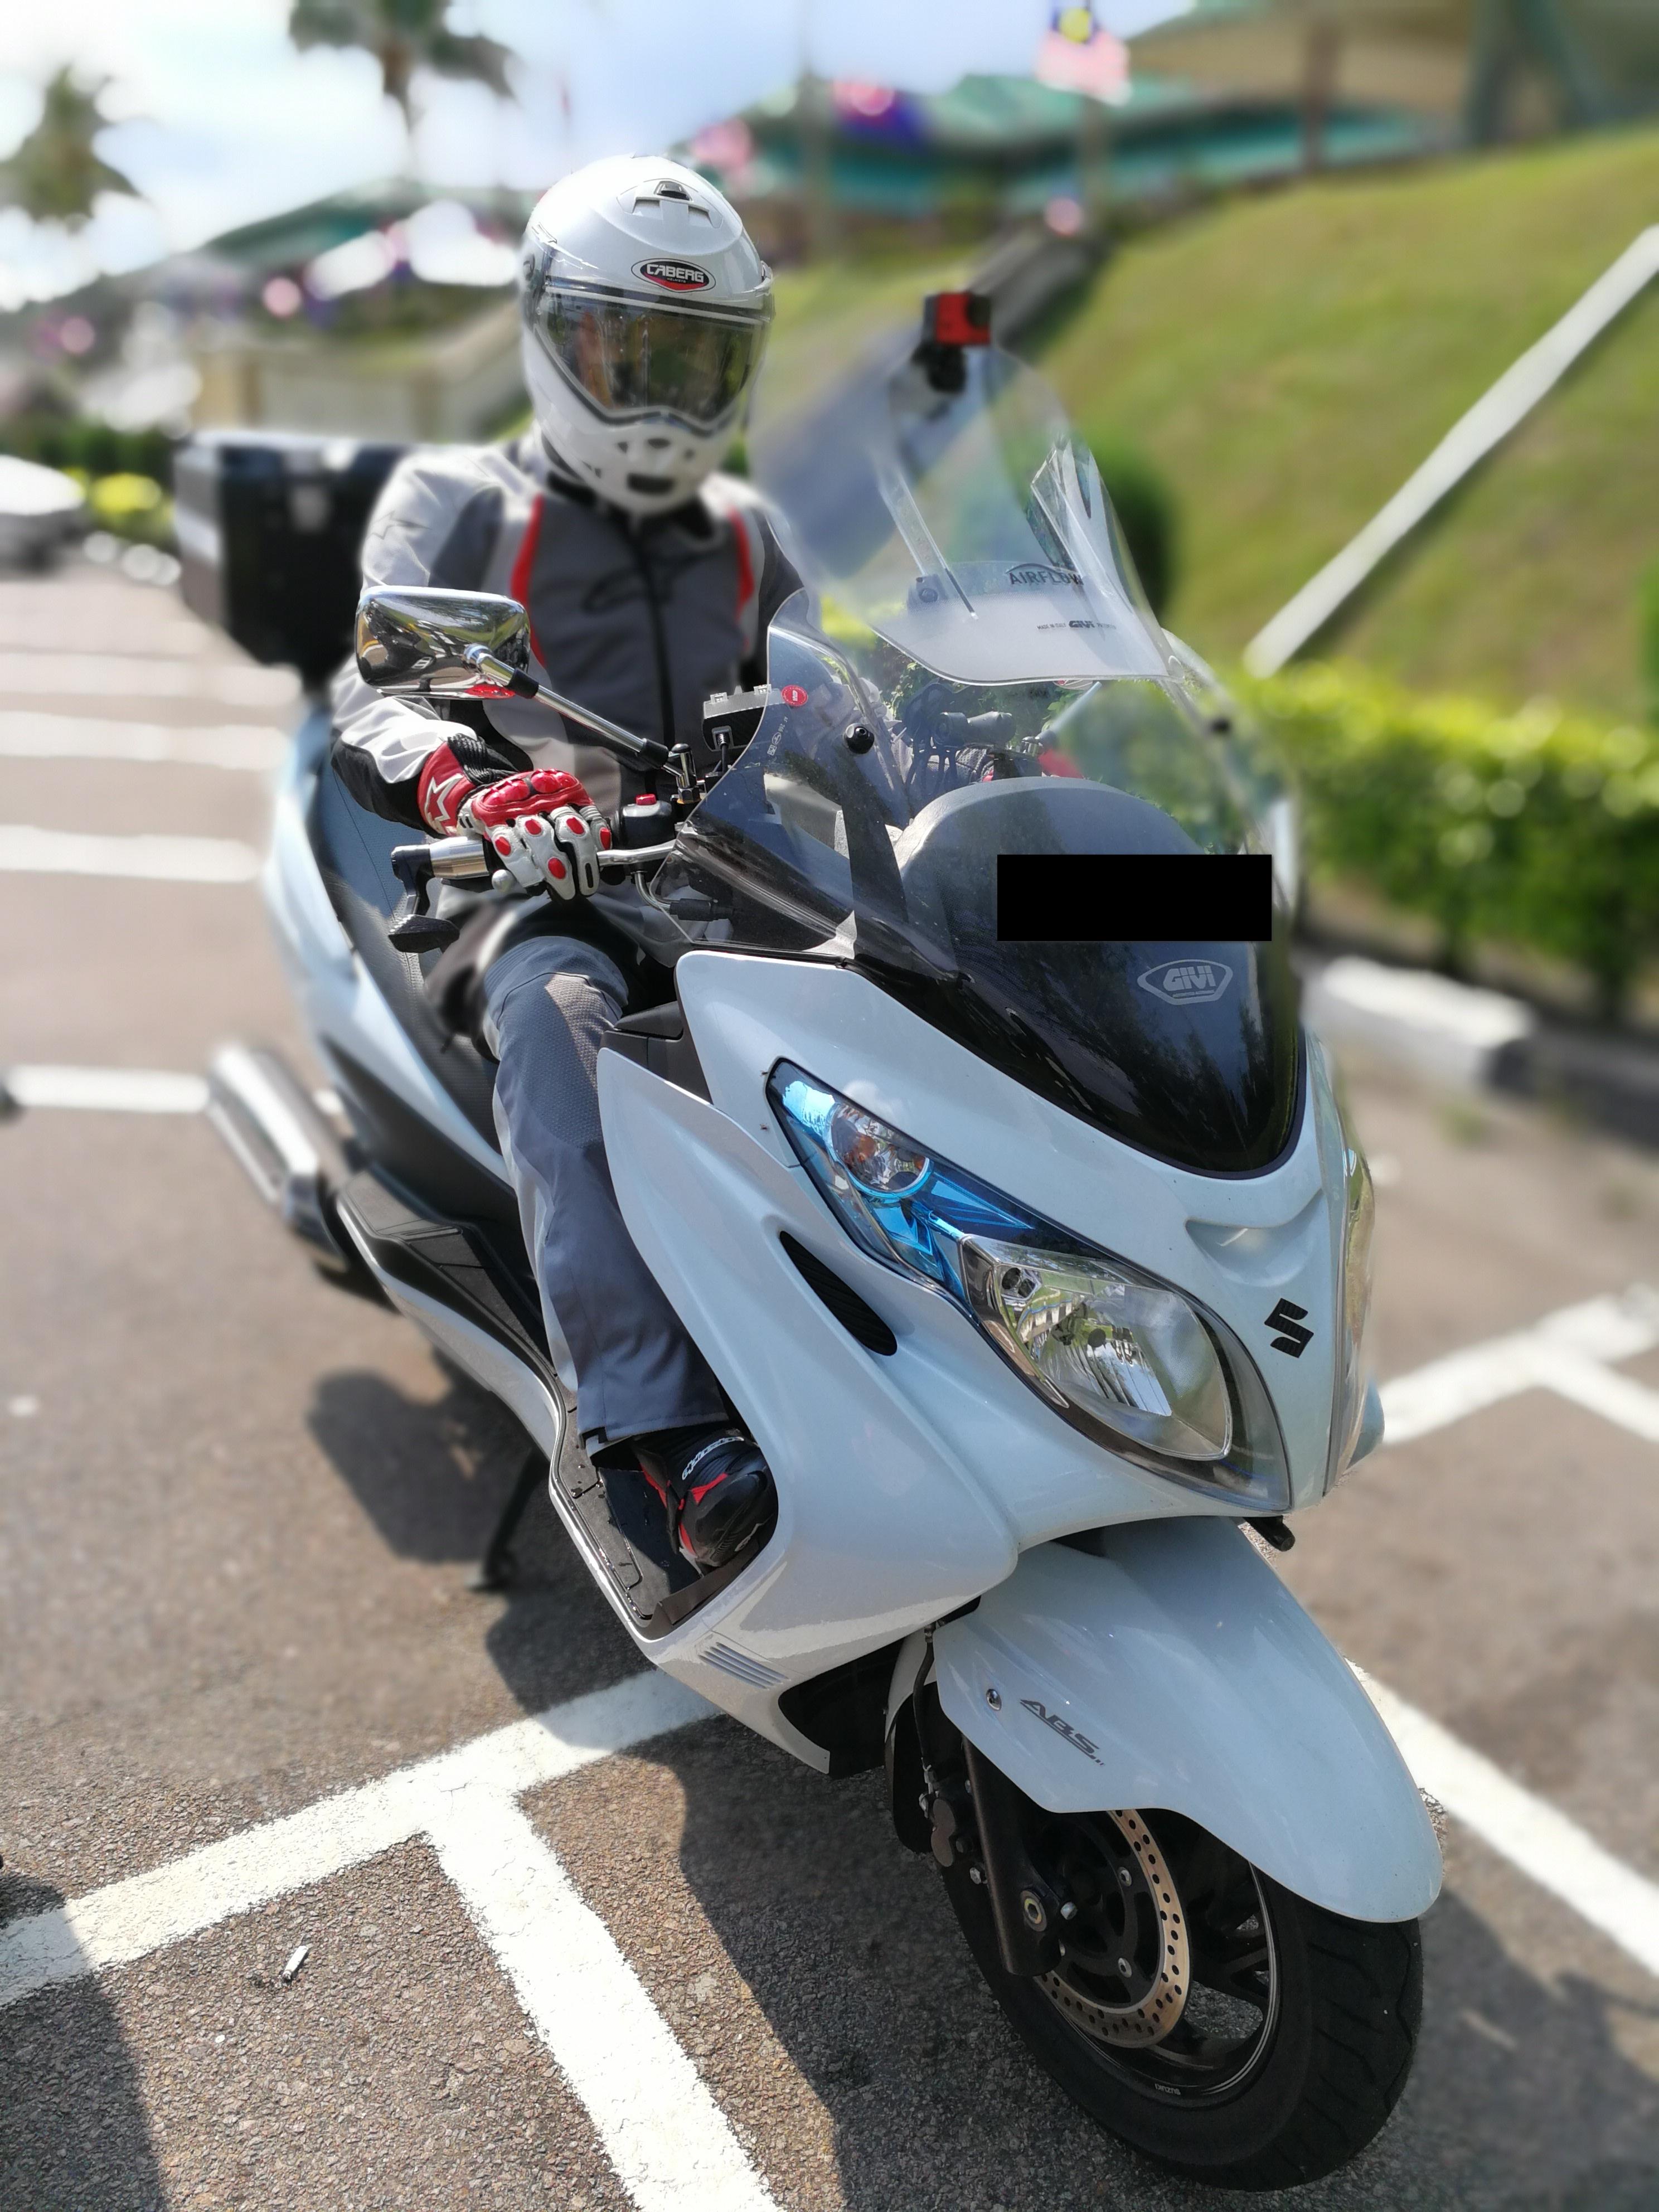 Posing on my Suzuki Burgman 400 at the pitstop on my way back from Malacca, Malaysia